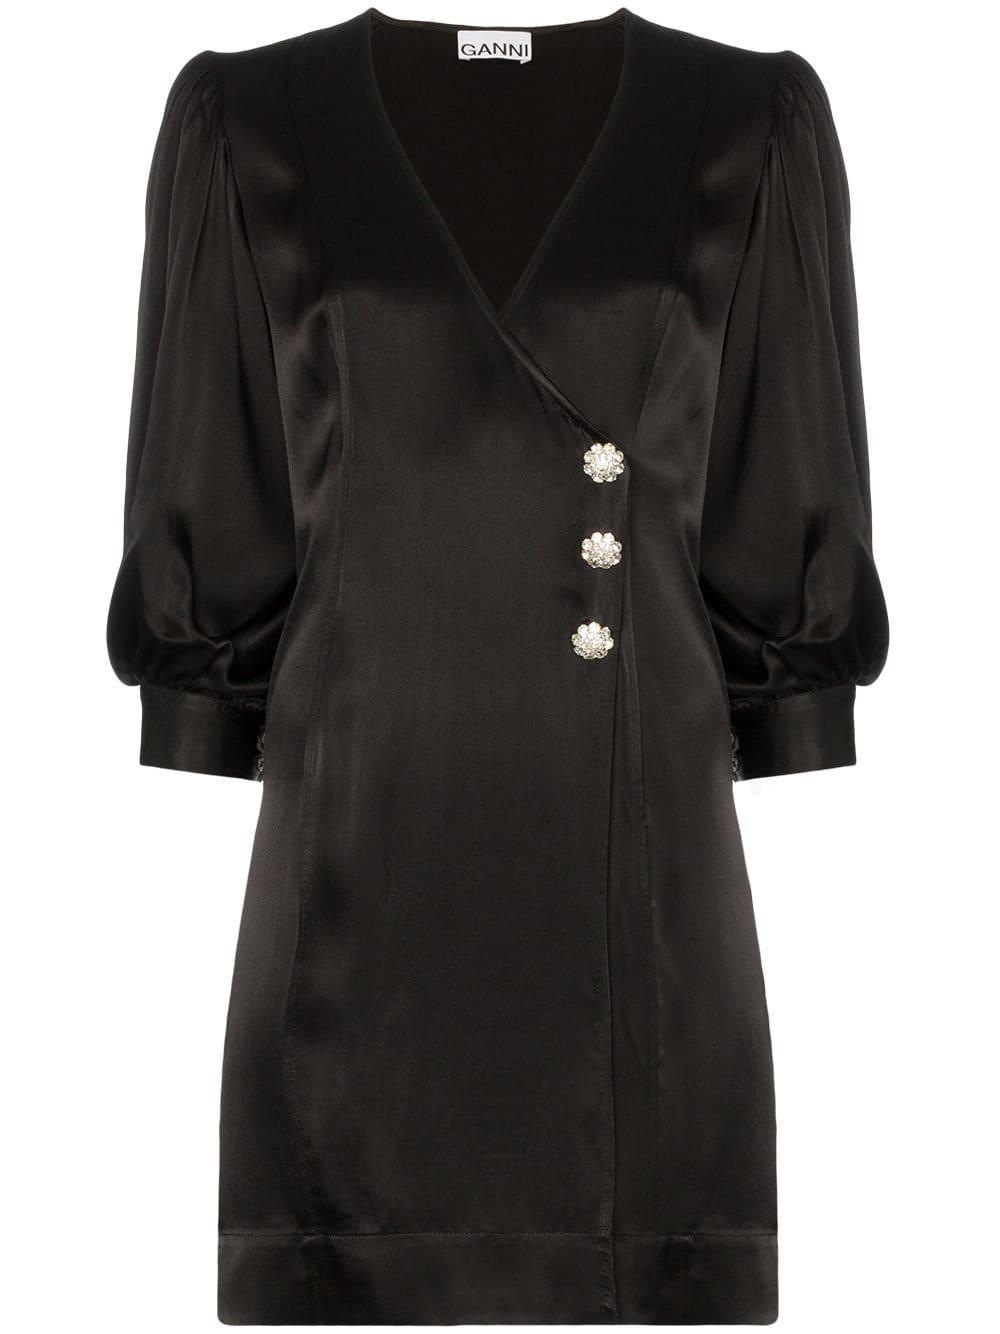 Heavy Satin Wrap Button Front Short Dress Item # F4044